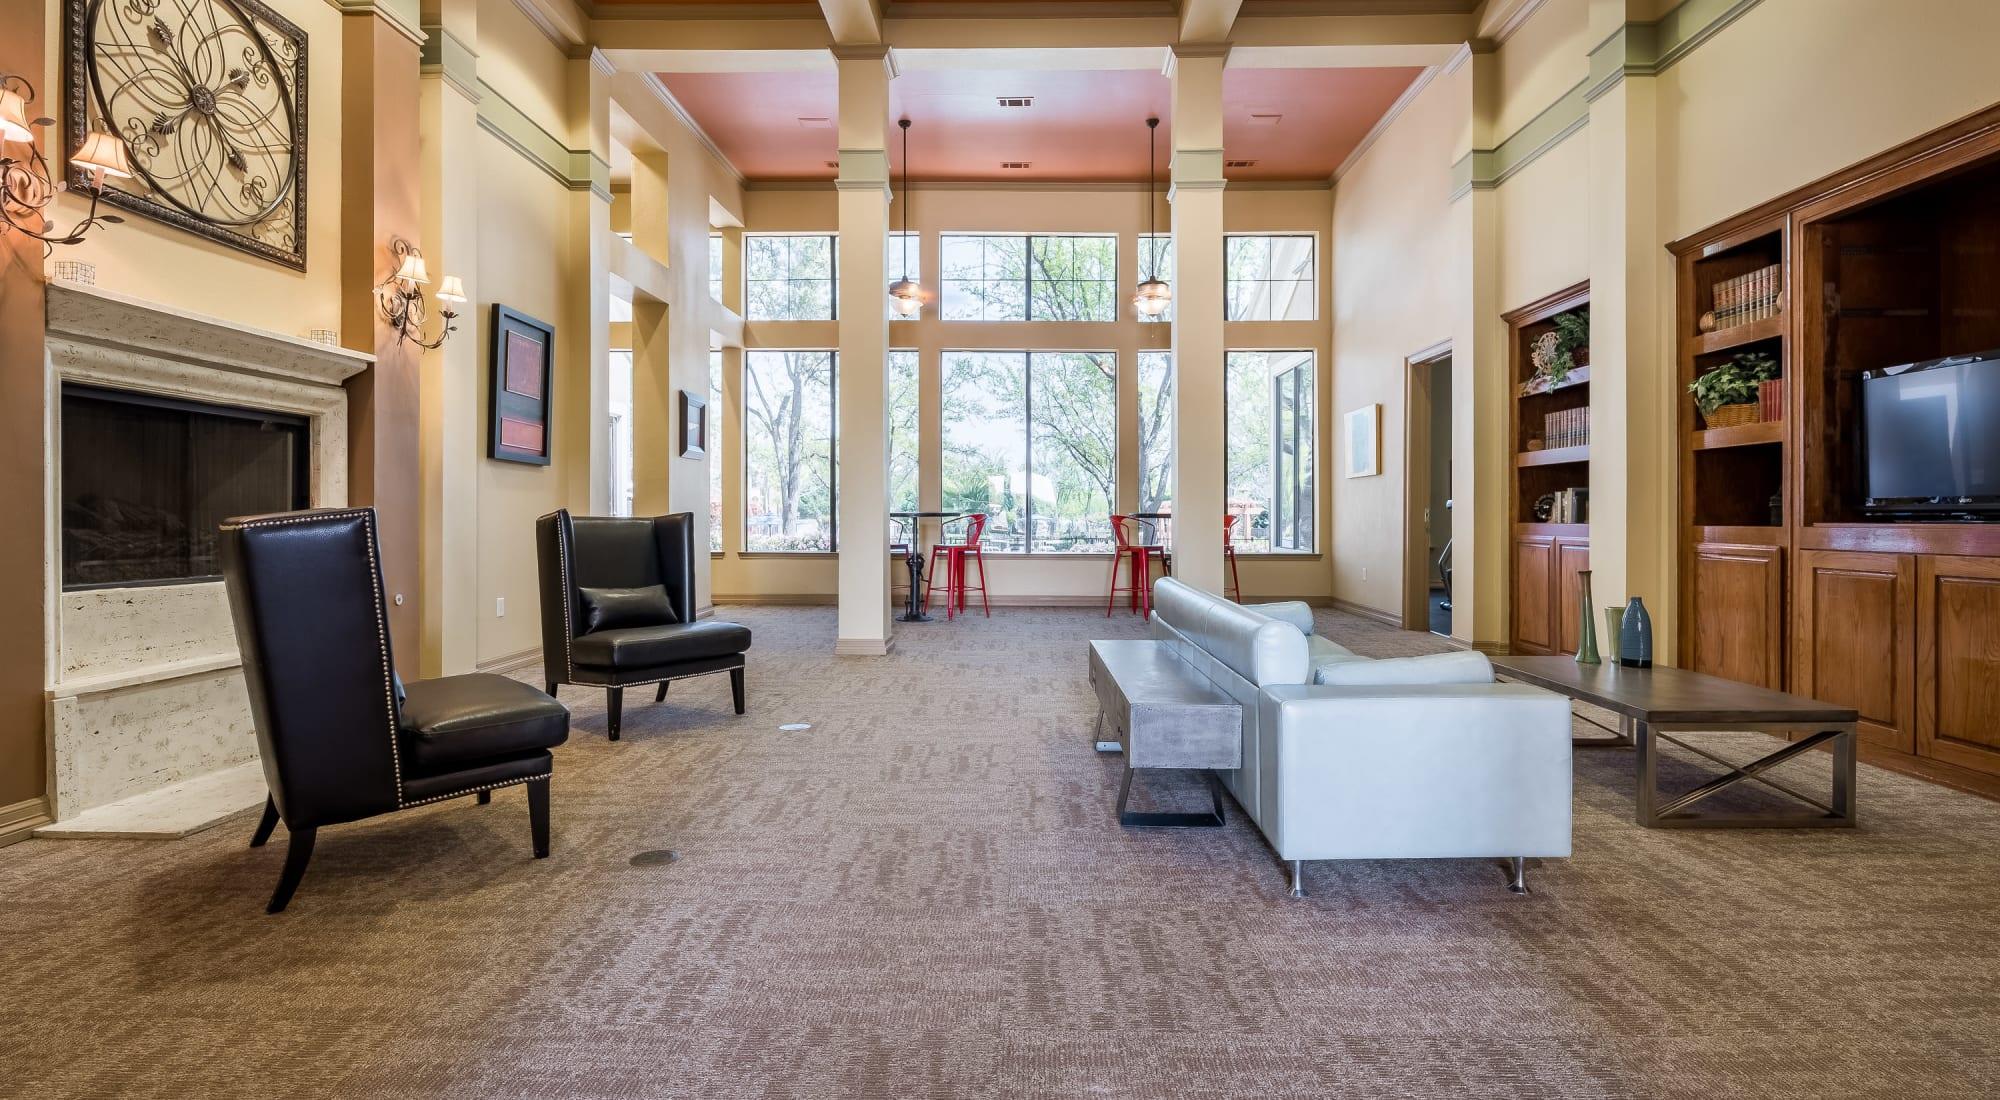 Reviews of Arbrook Park Apartment Homes in Arlington, Texas